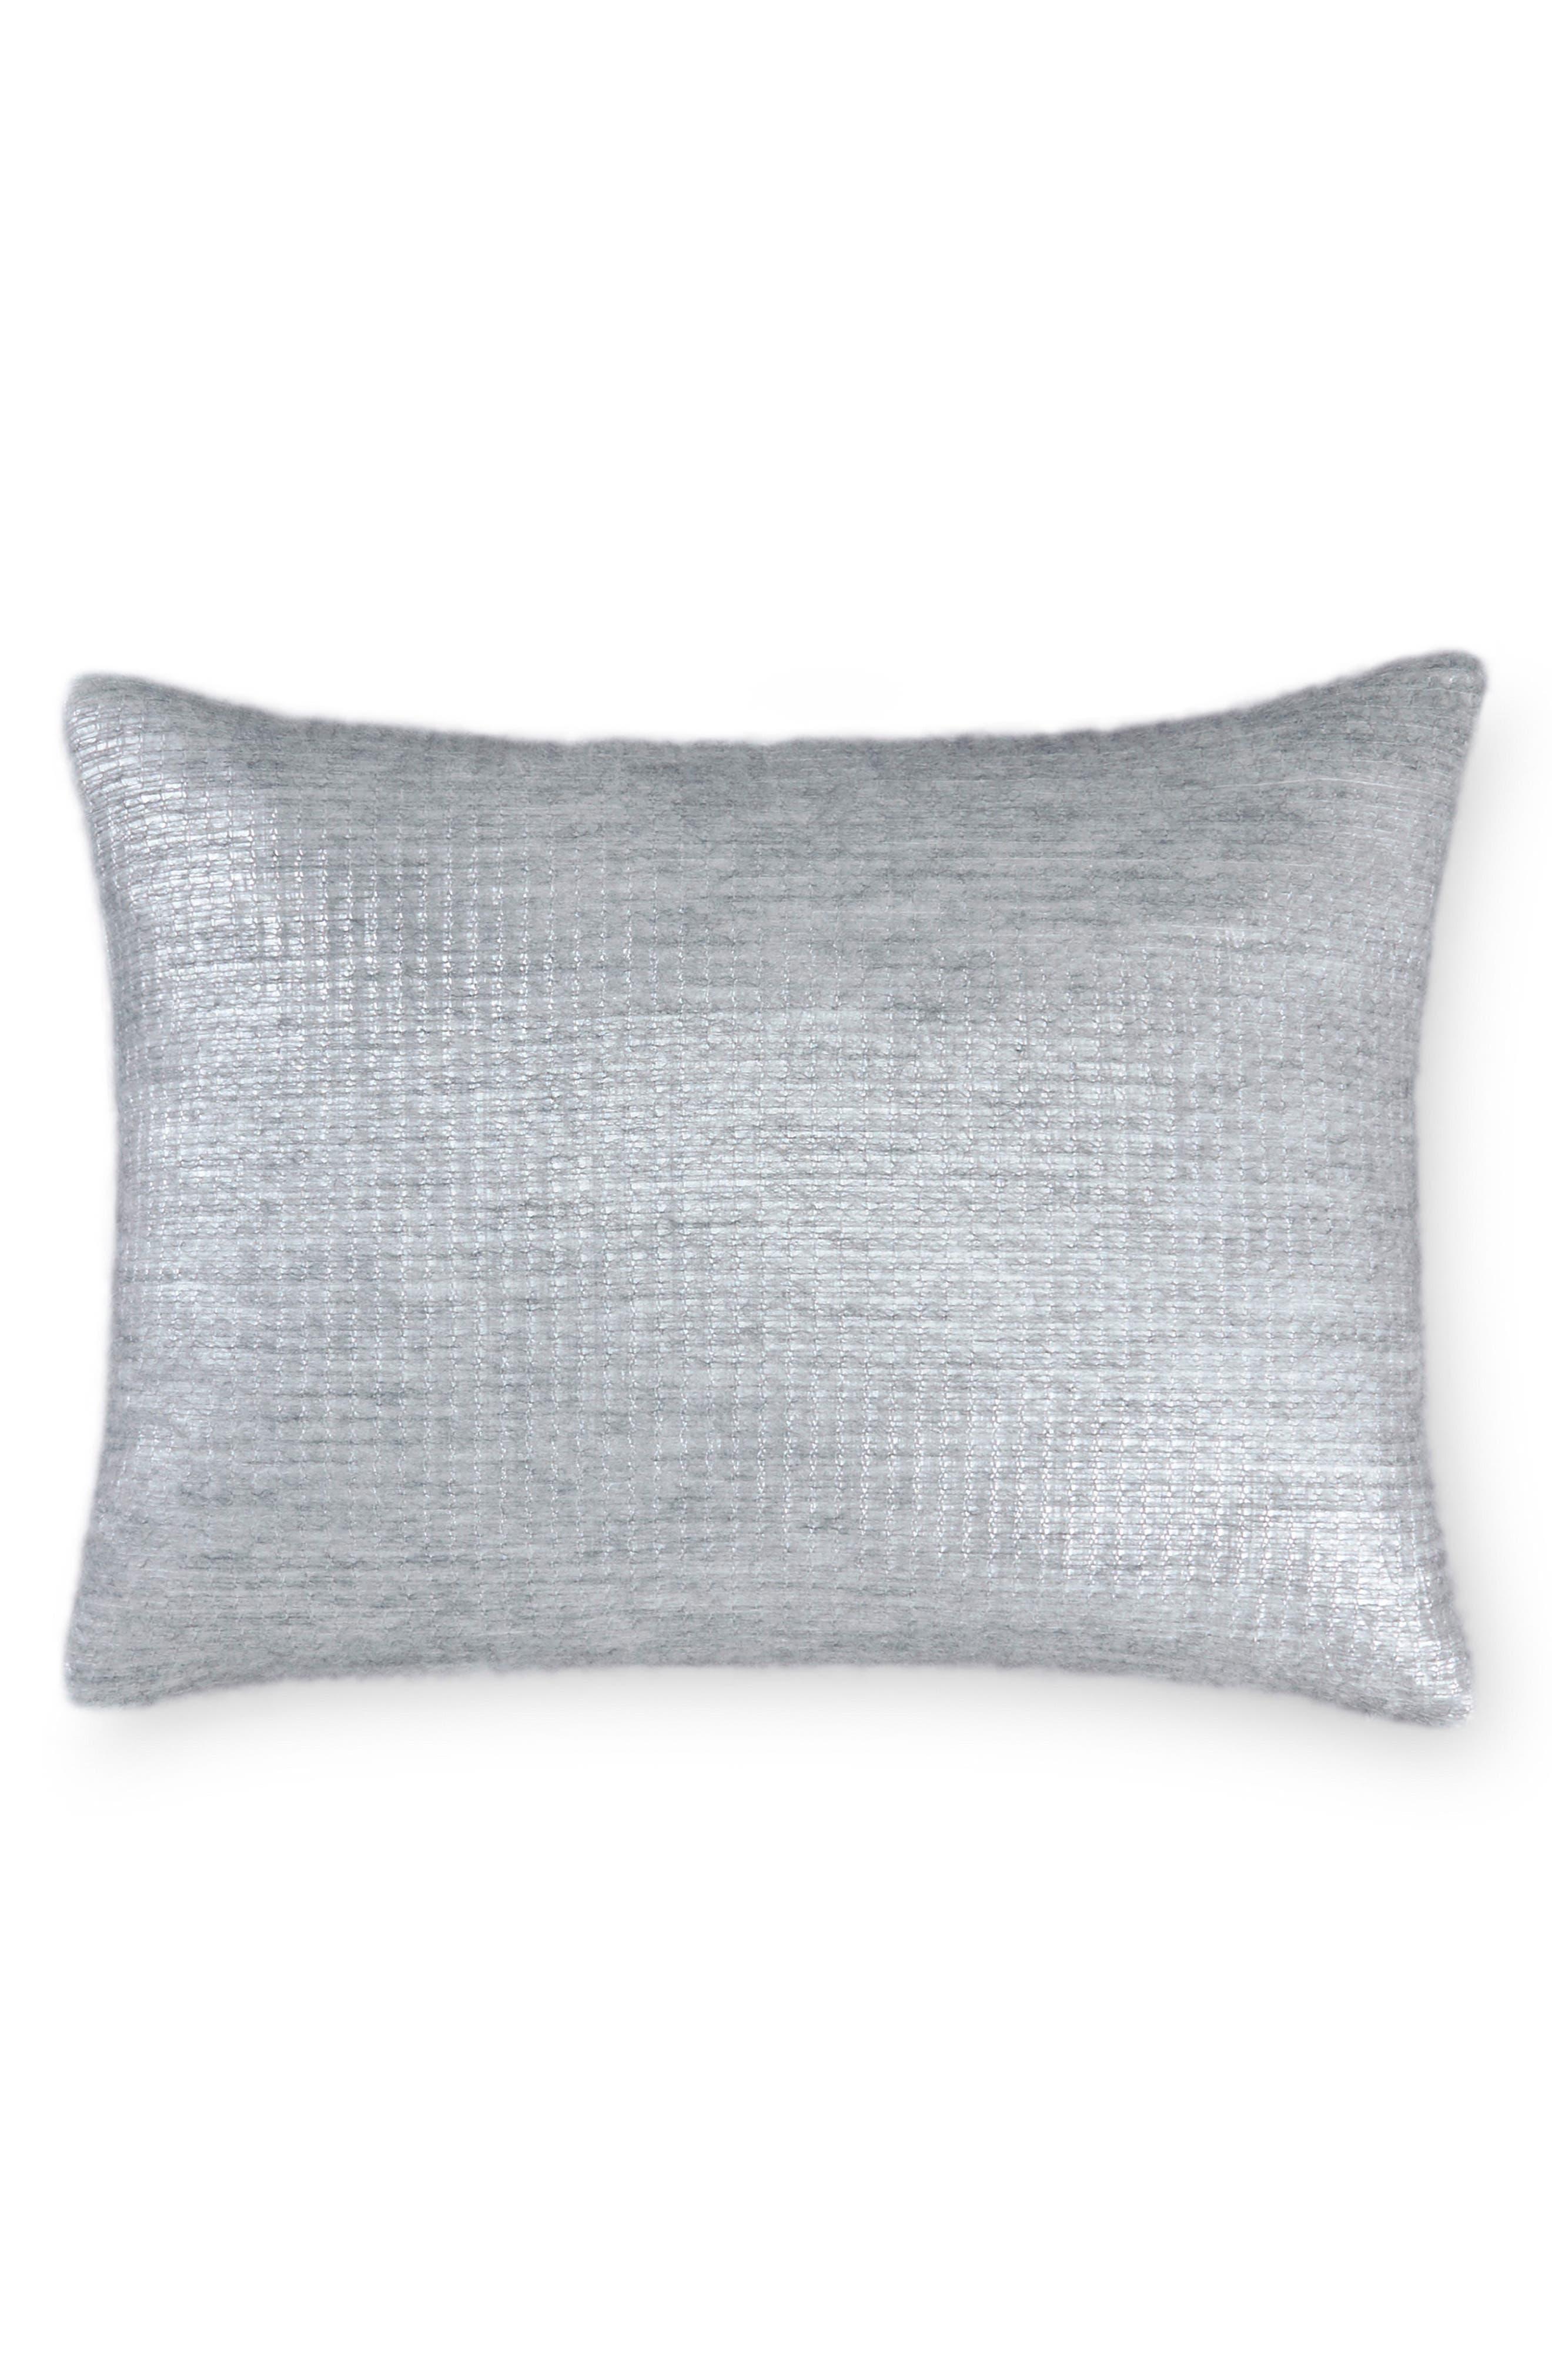 Fonta Accent Pillow,                         Main,                         color, 045